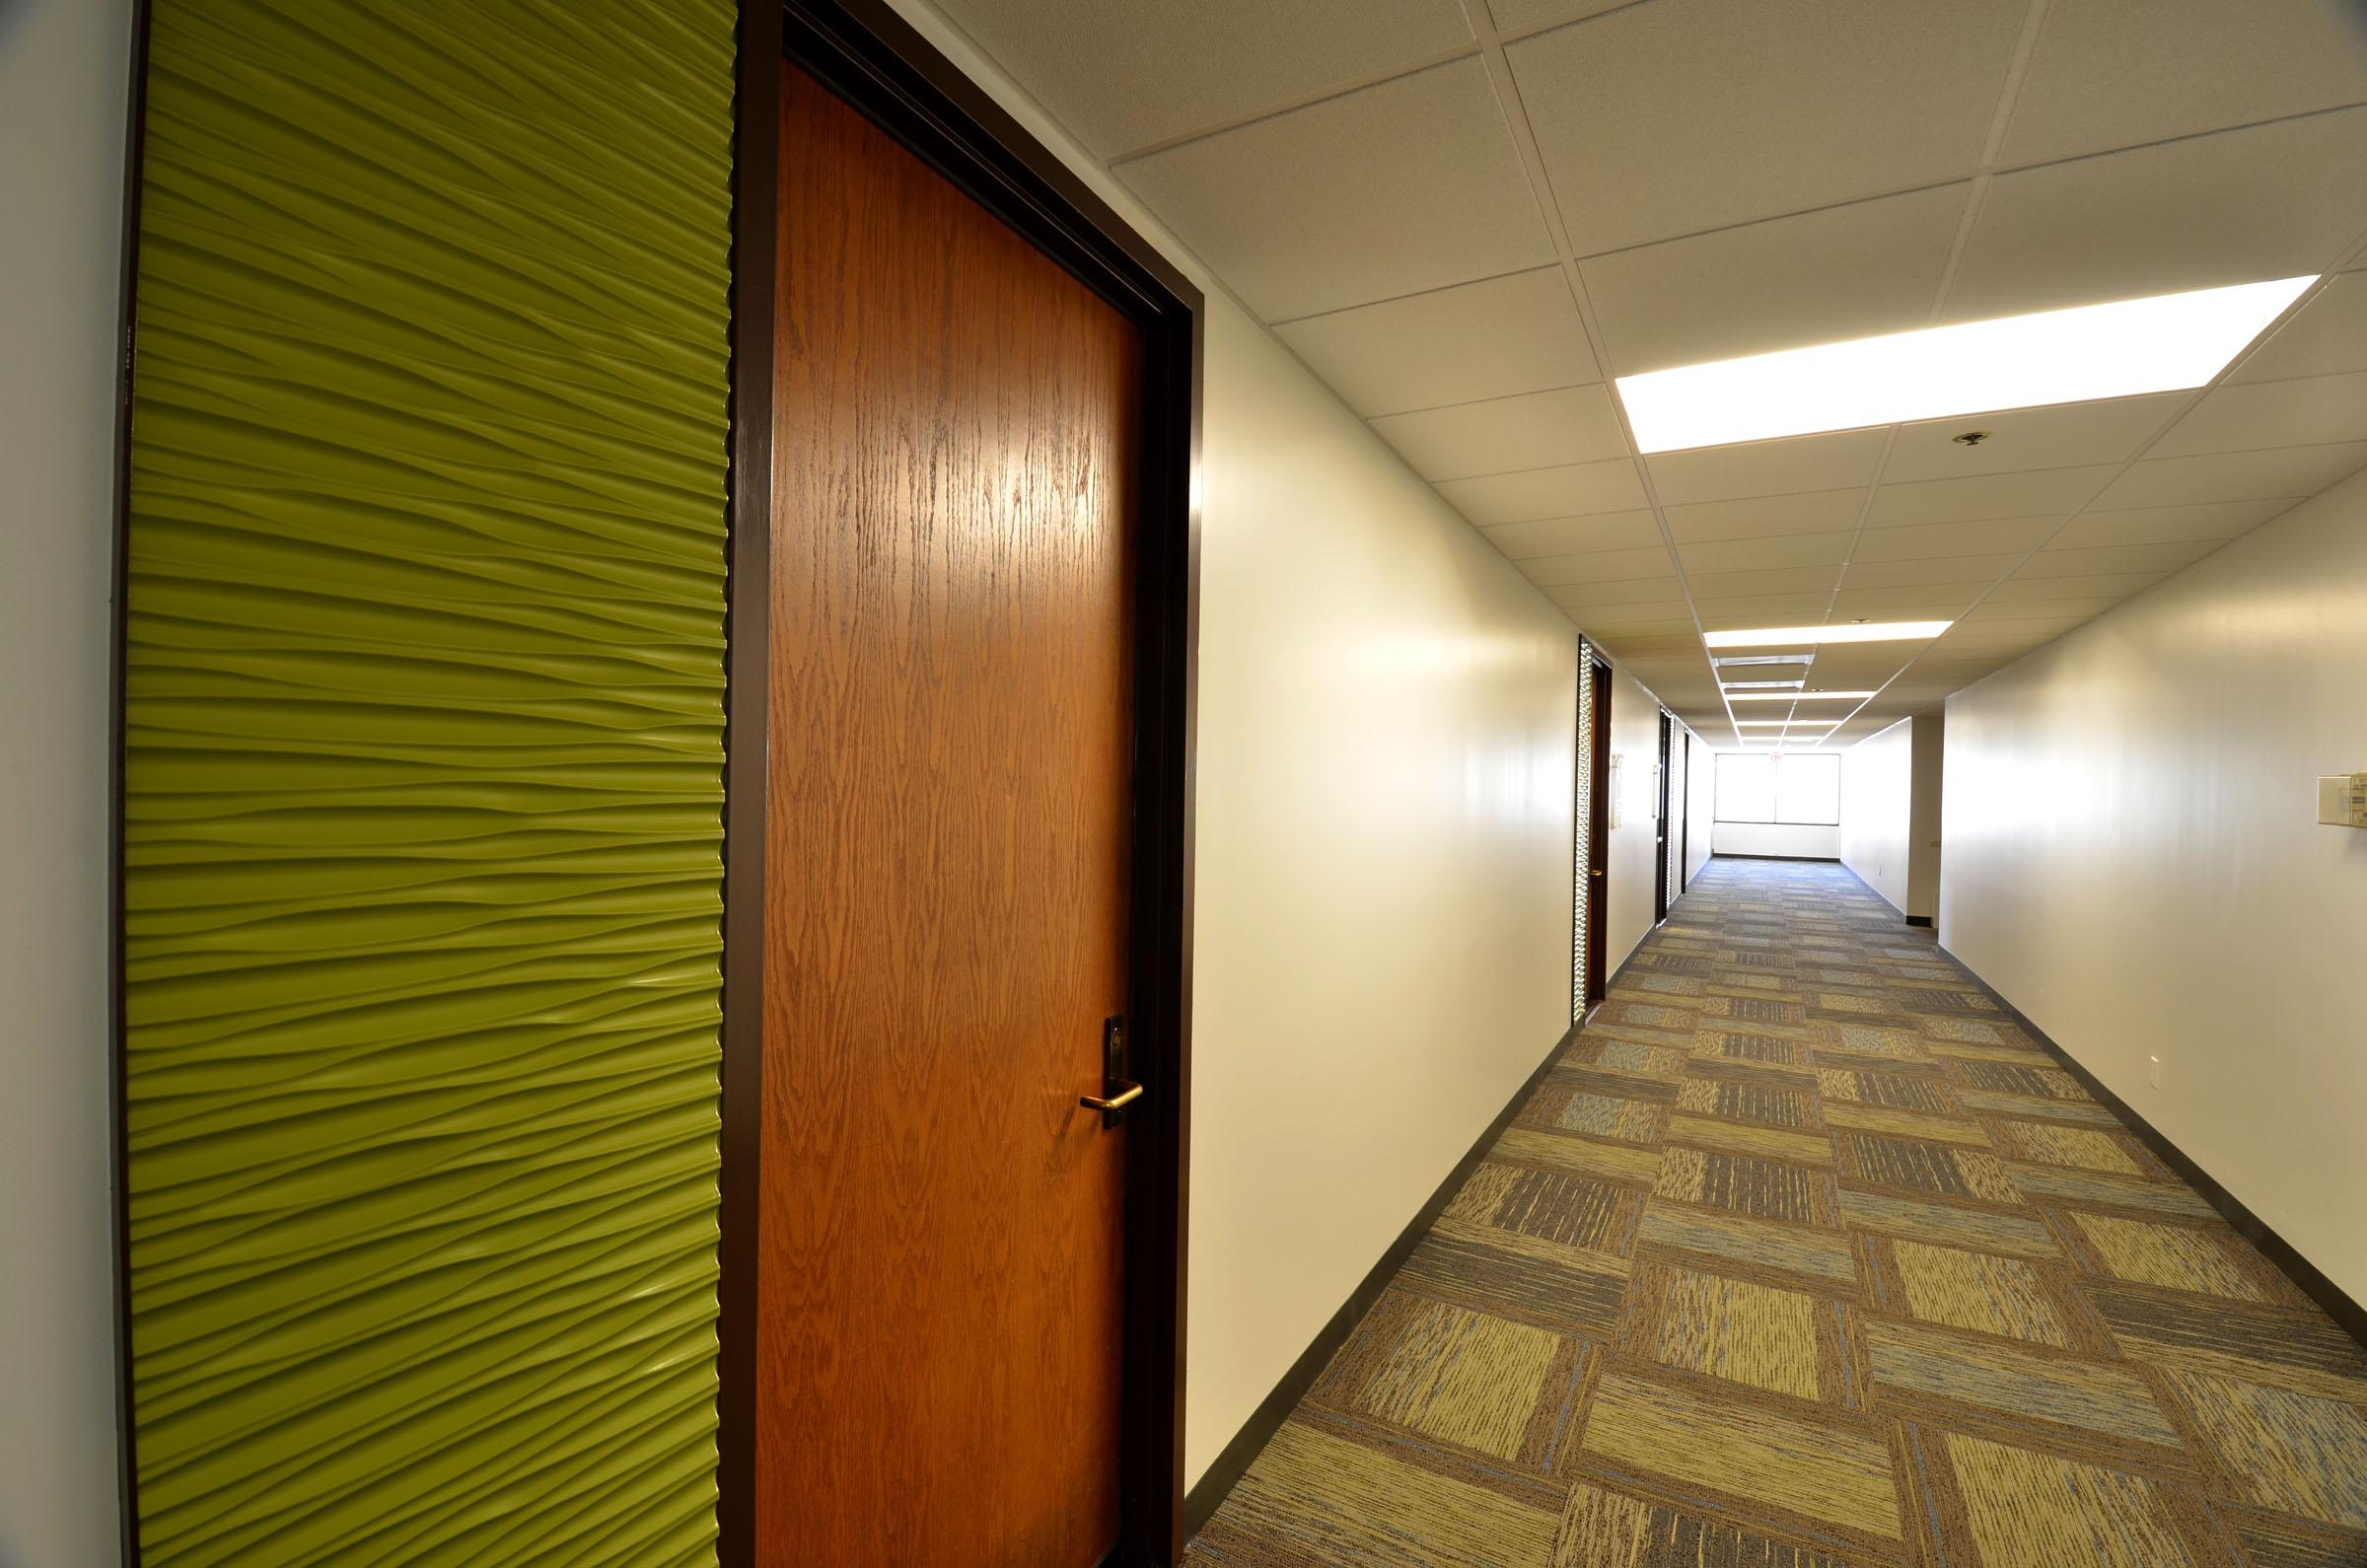 Baywood Interior Design